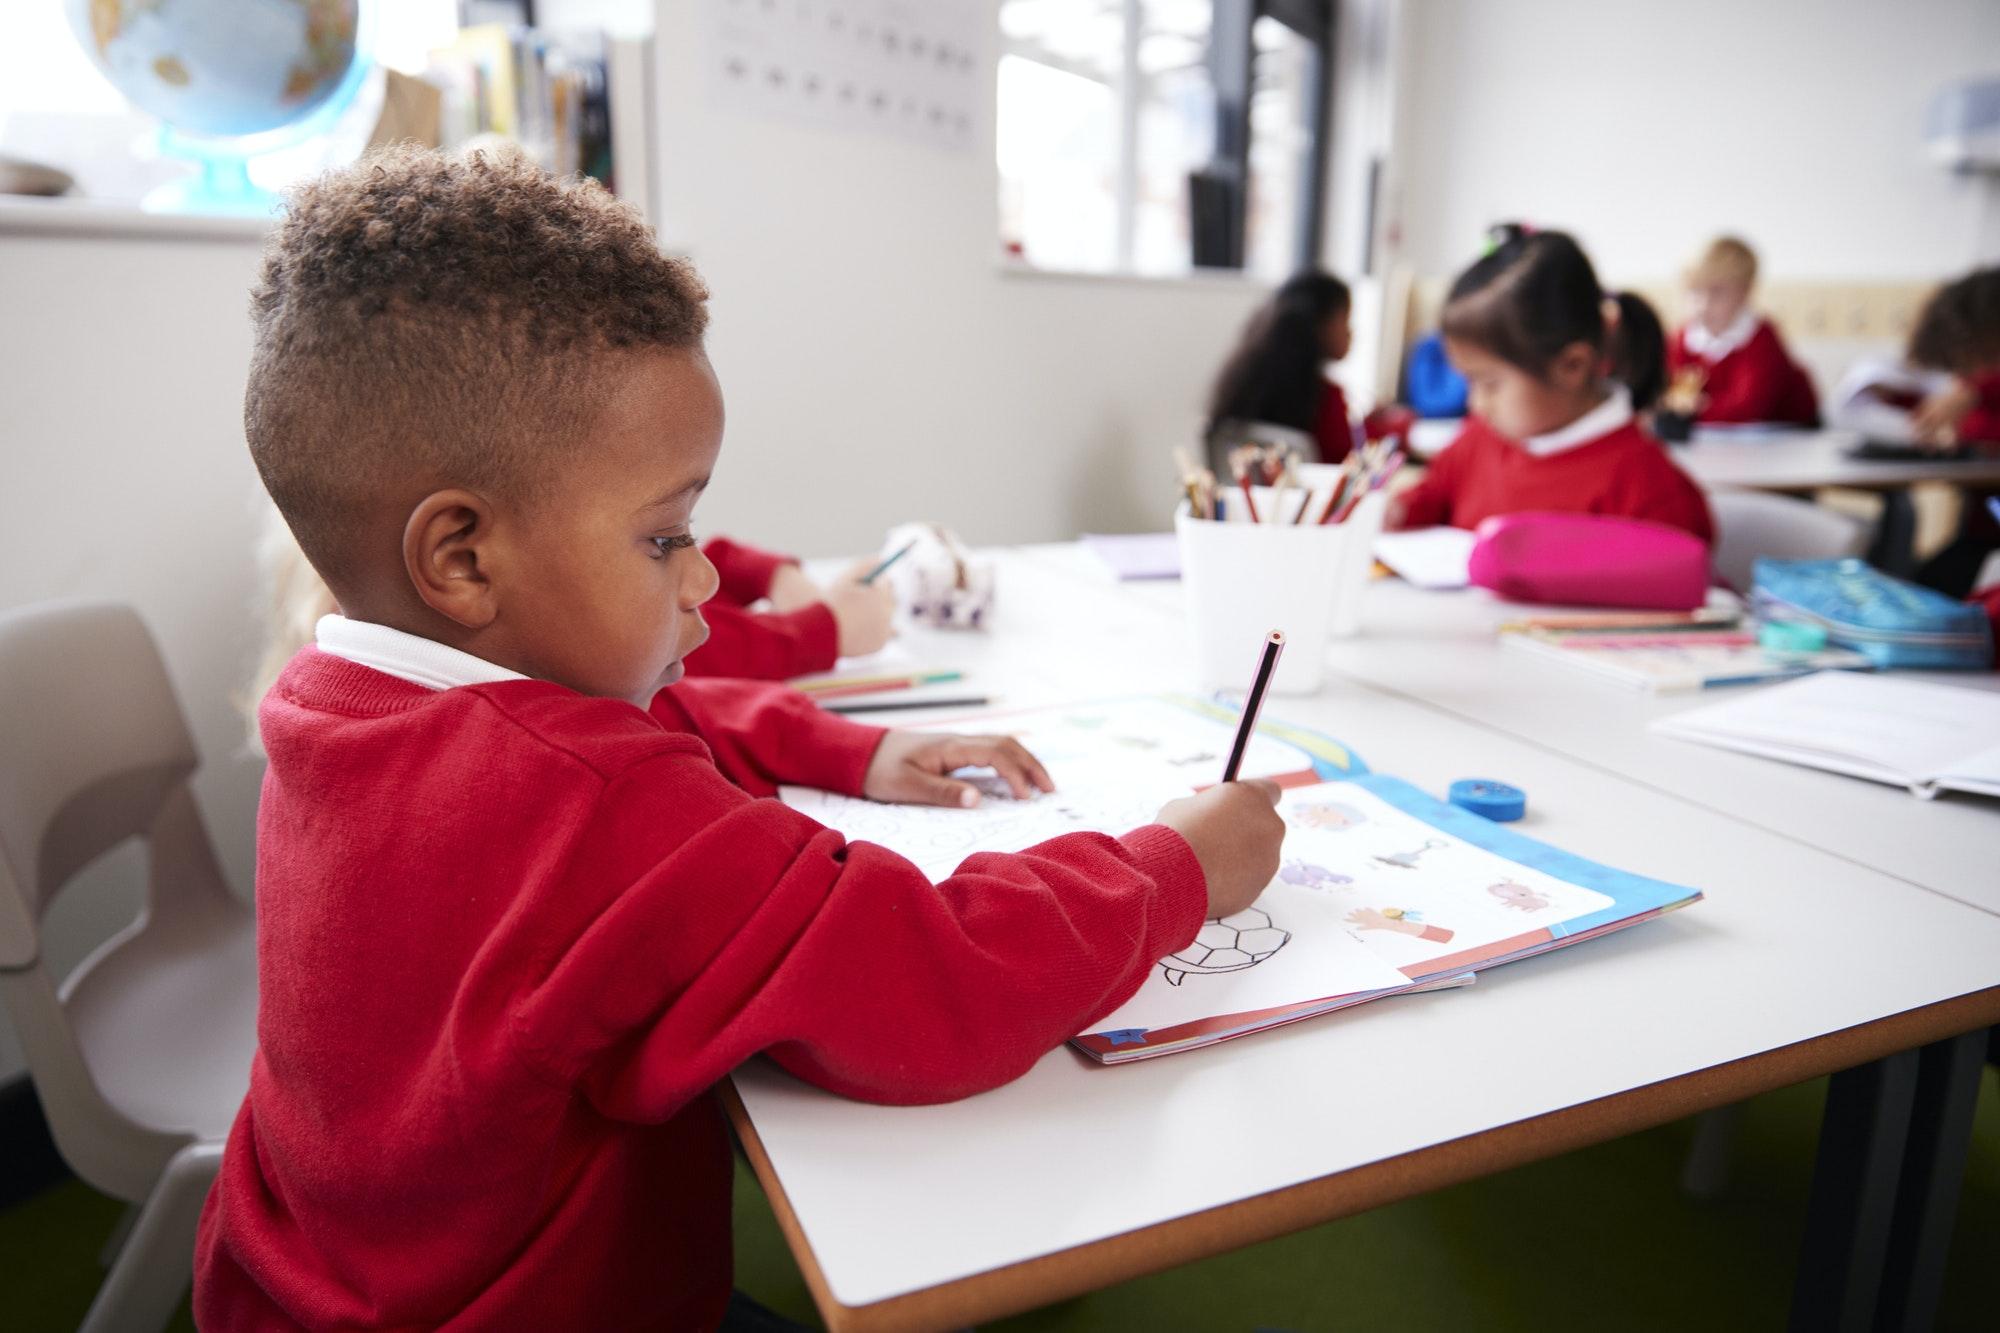 Young black schoolboy wearing school uniform sitting at a desk in an infant school classroom drawing